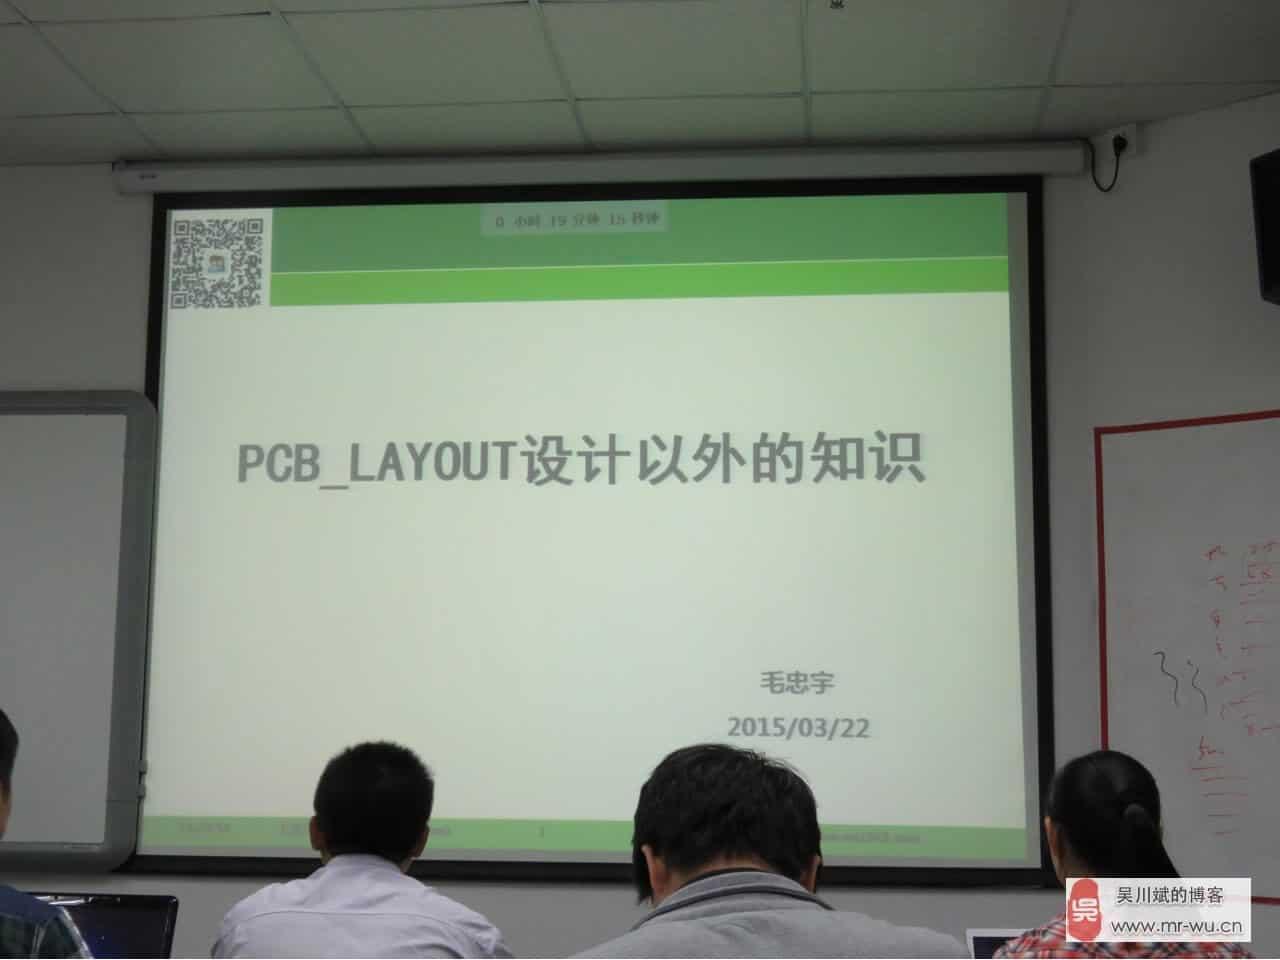 pcb-layout-%e8%81%8c%e4%b8%9a%e8%a7%84%e5%88%92-1